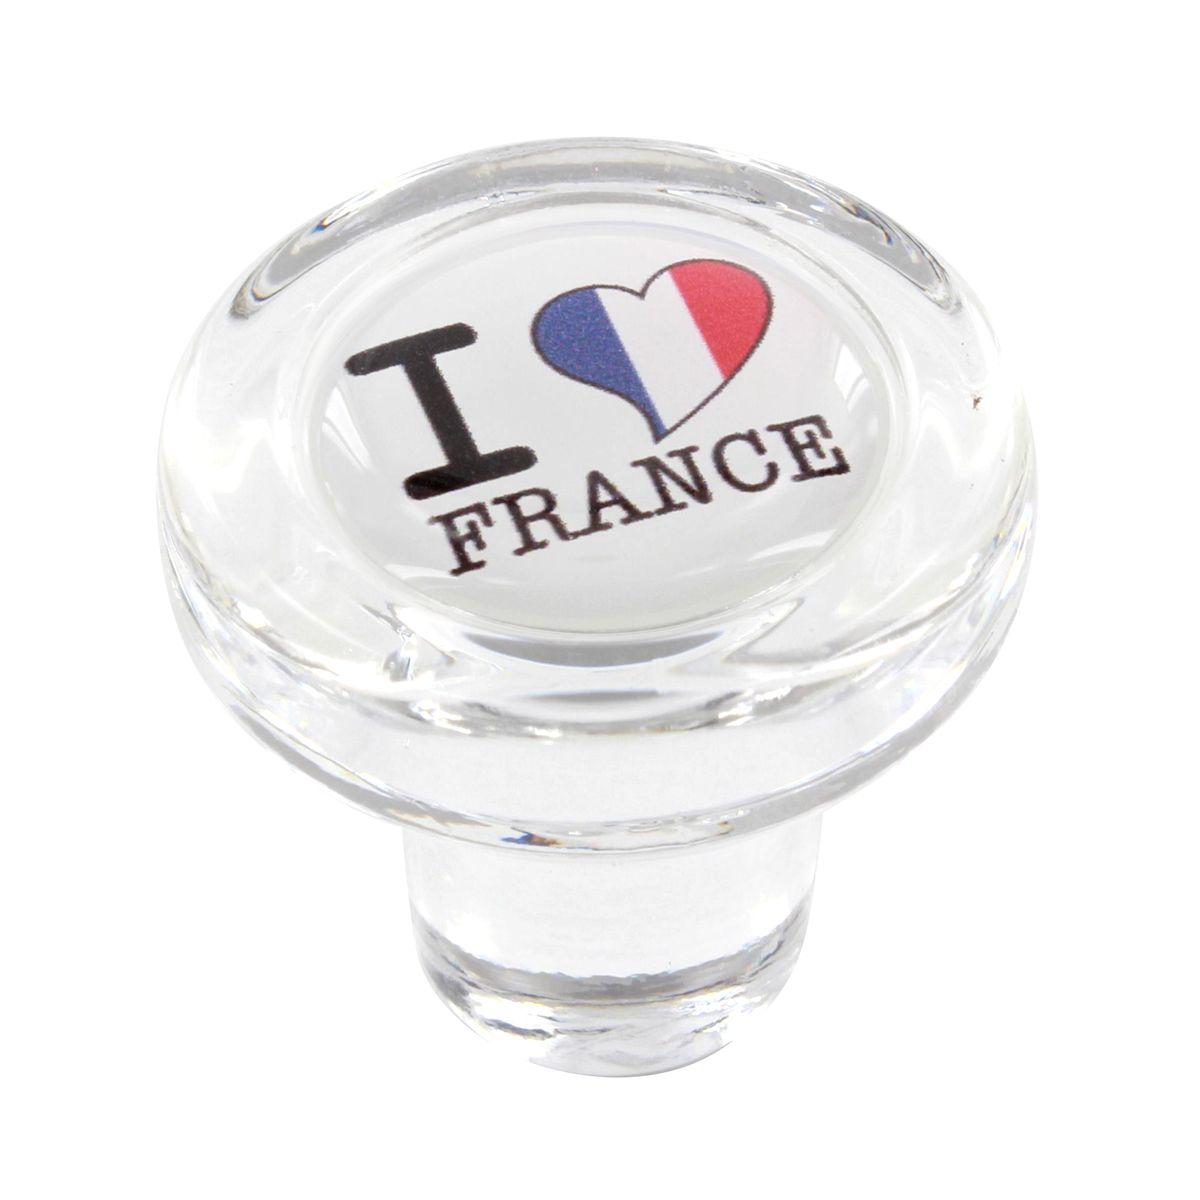 Bouchon en verre i love france - Cevenpack